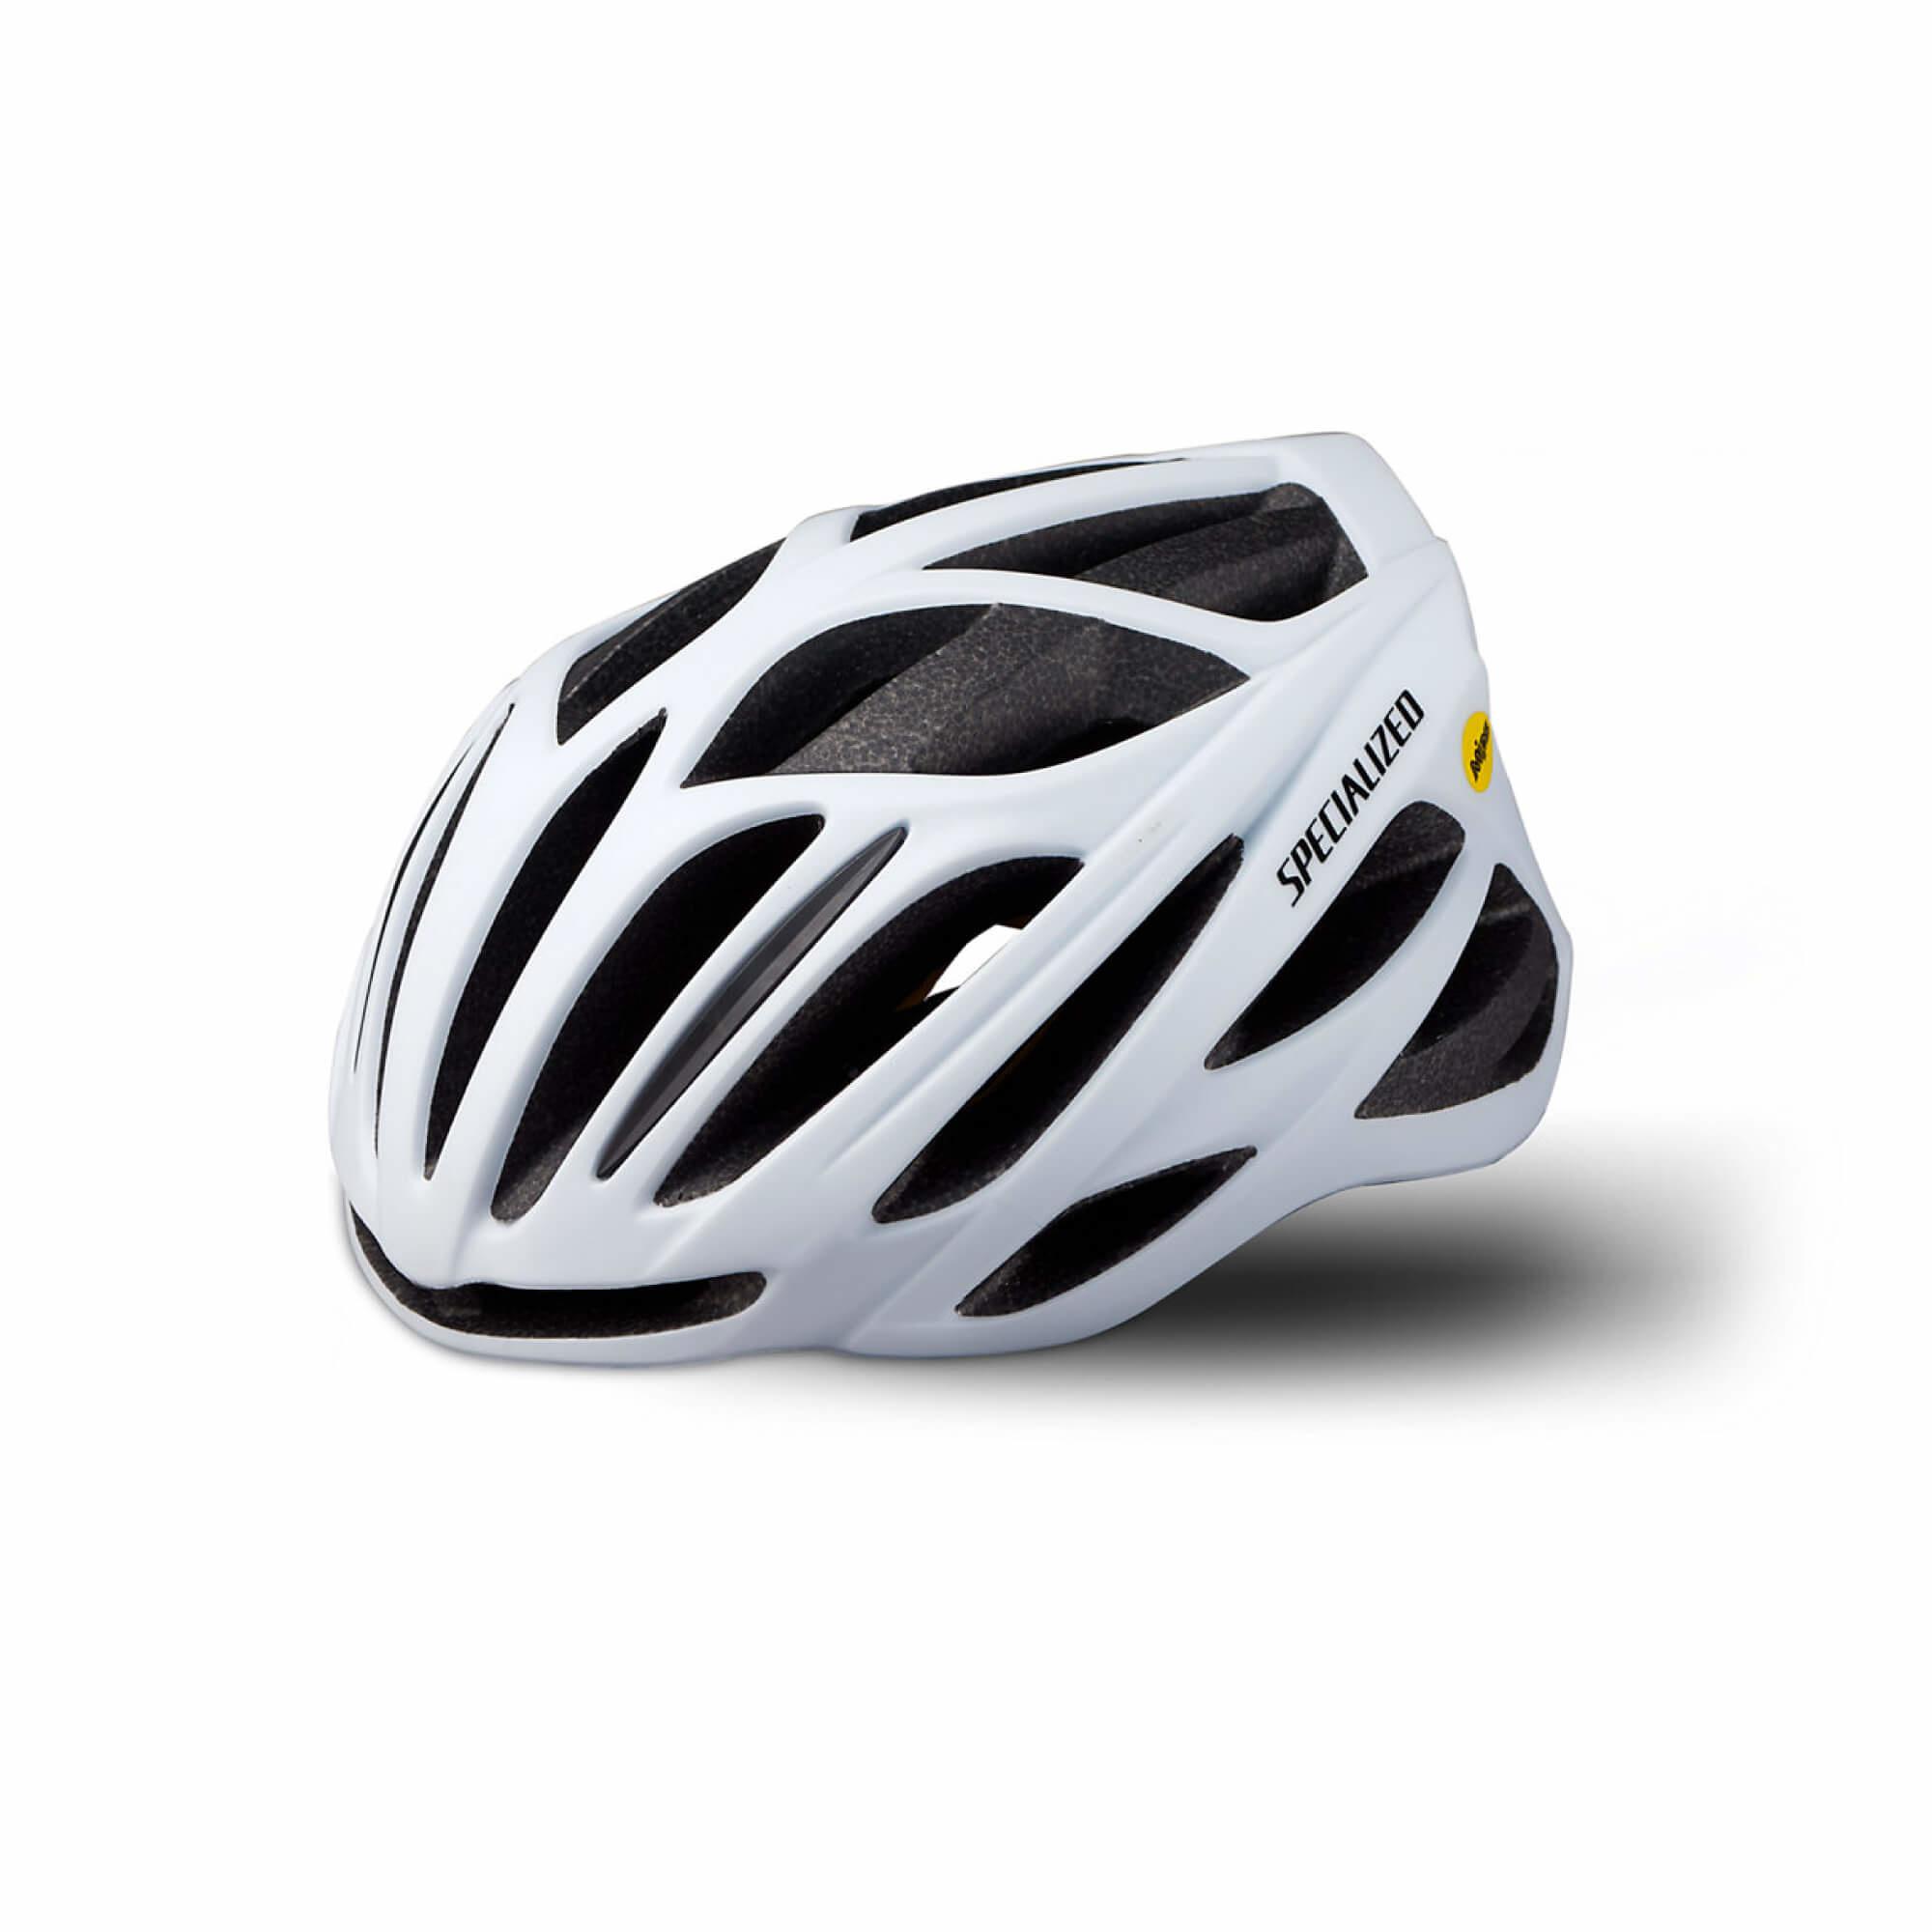 Echelon II Helmet Mips-9